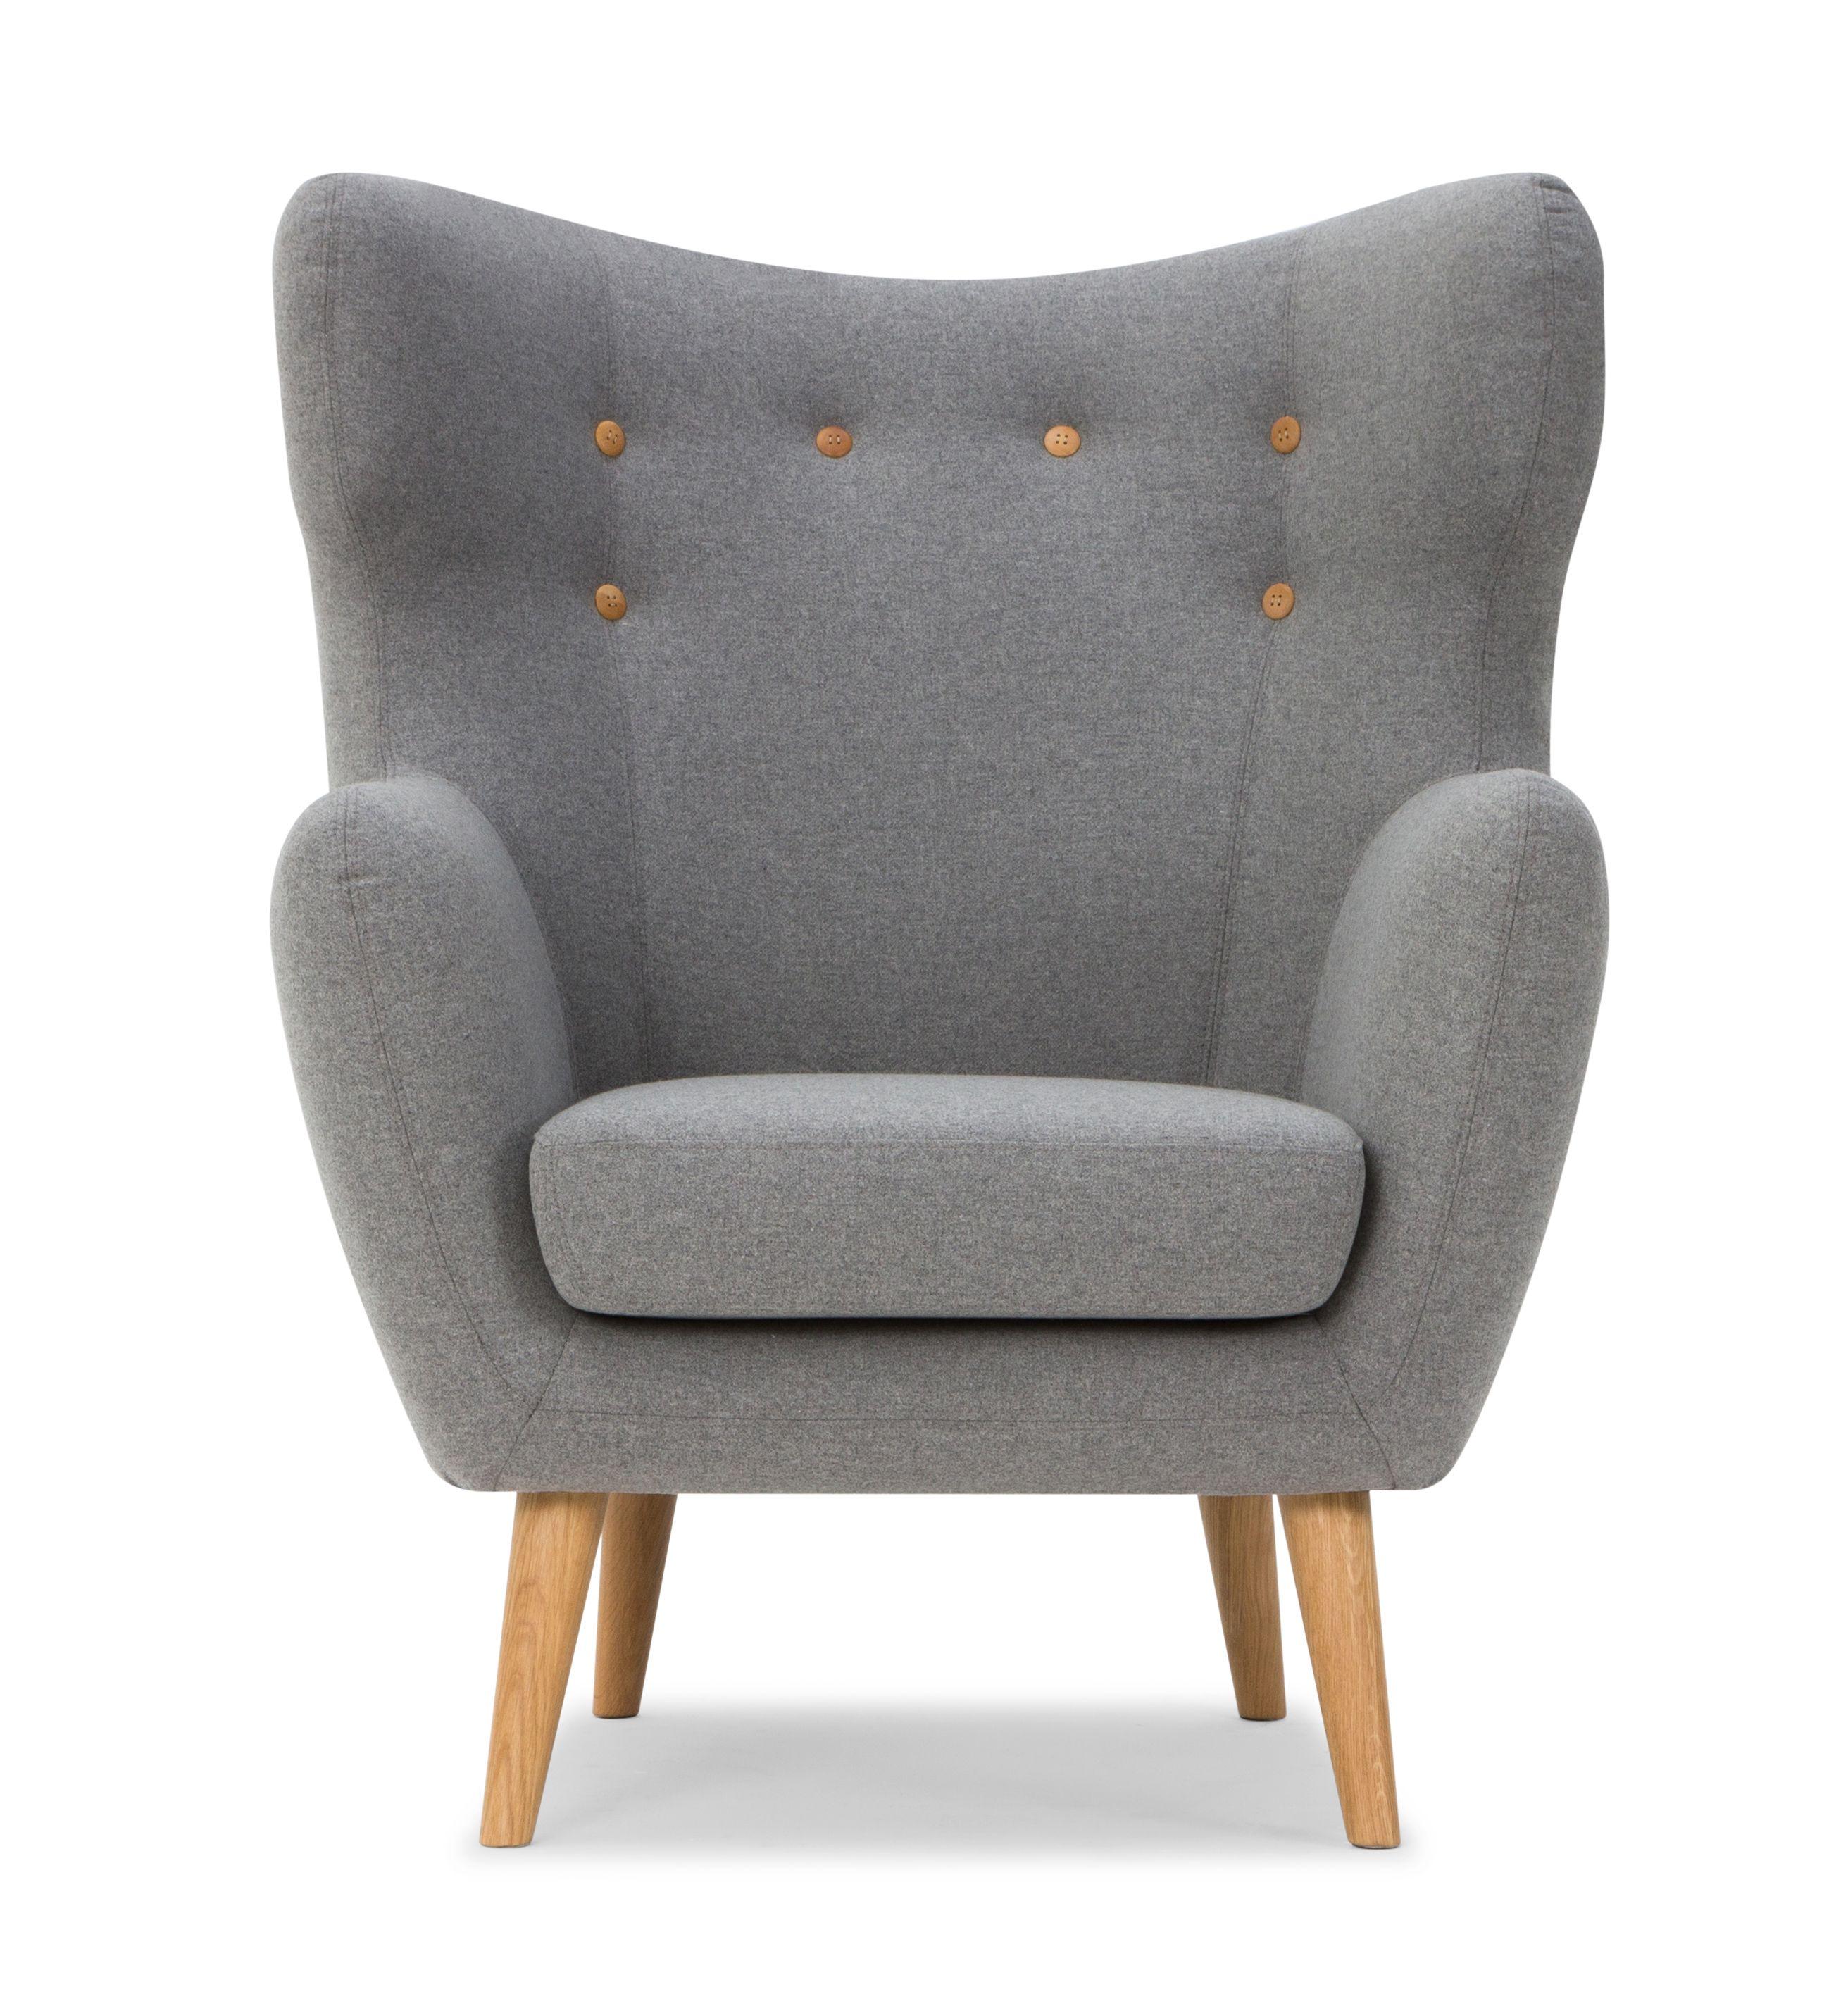 Charli Lounge Chair By Scandinavian Design. #hunterfurniture For  #furniturehunters